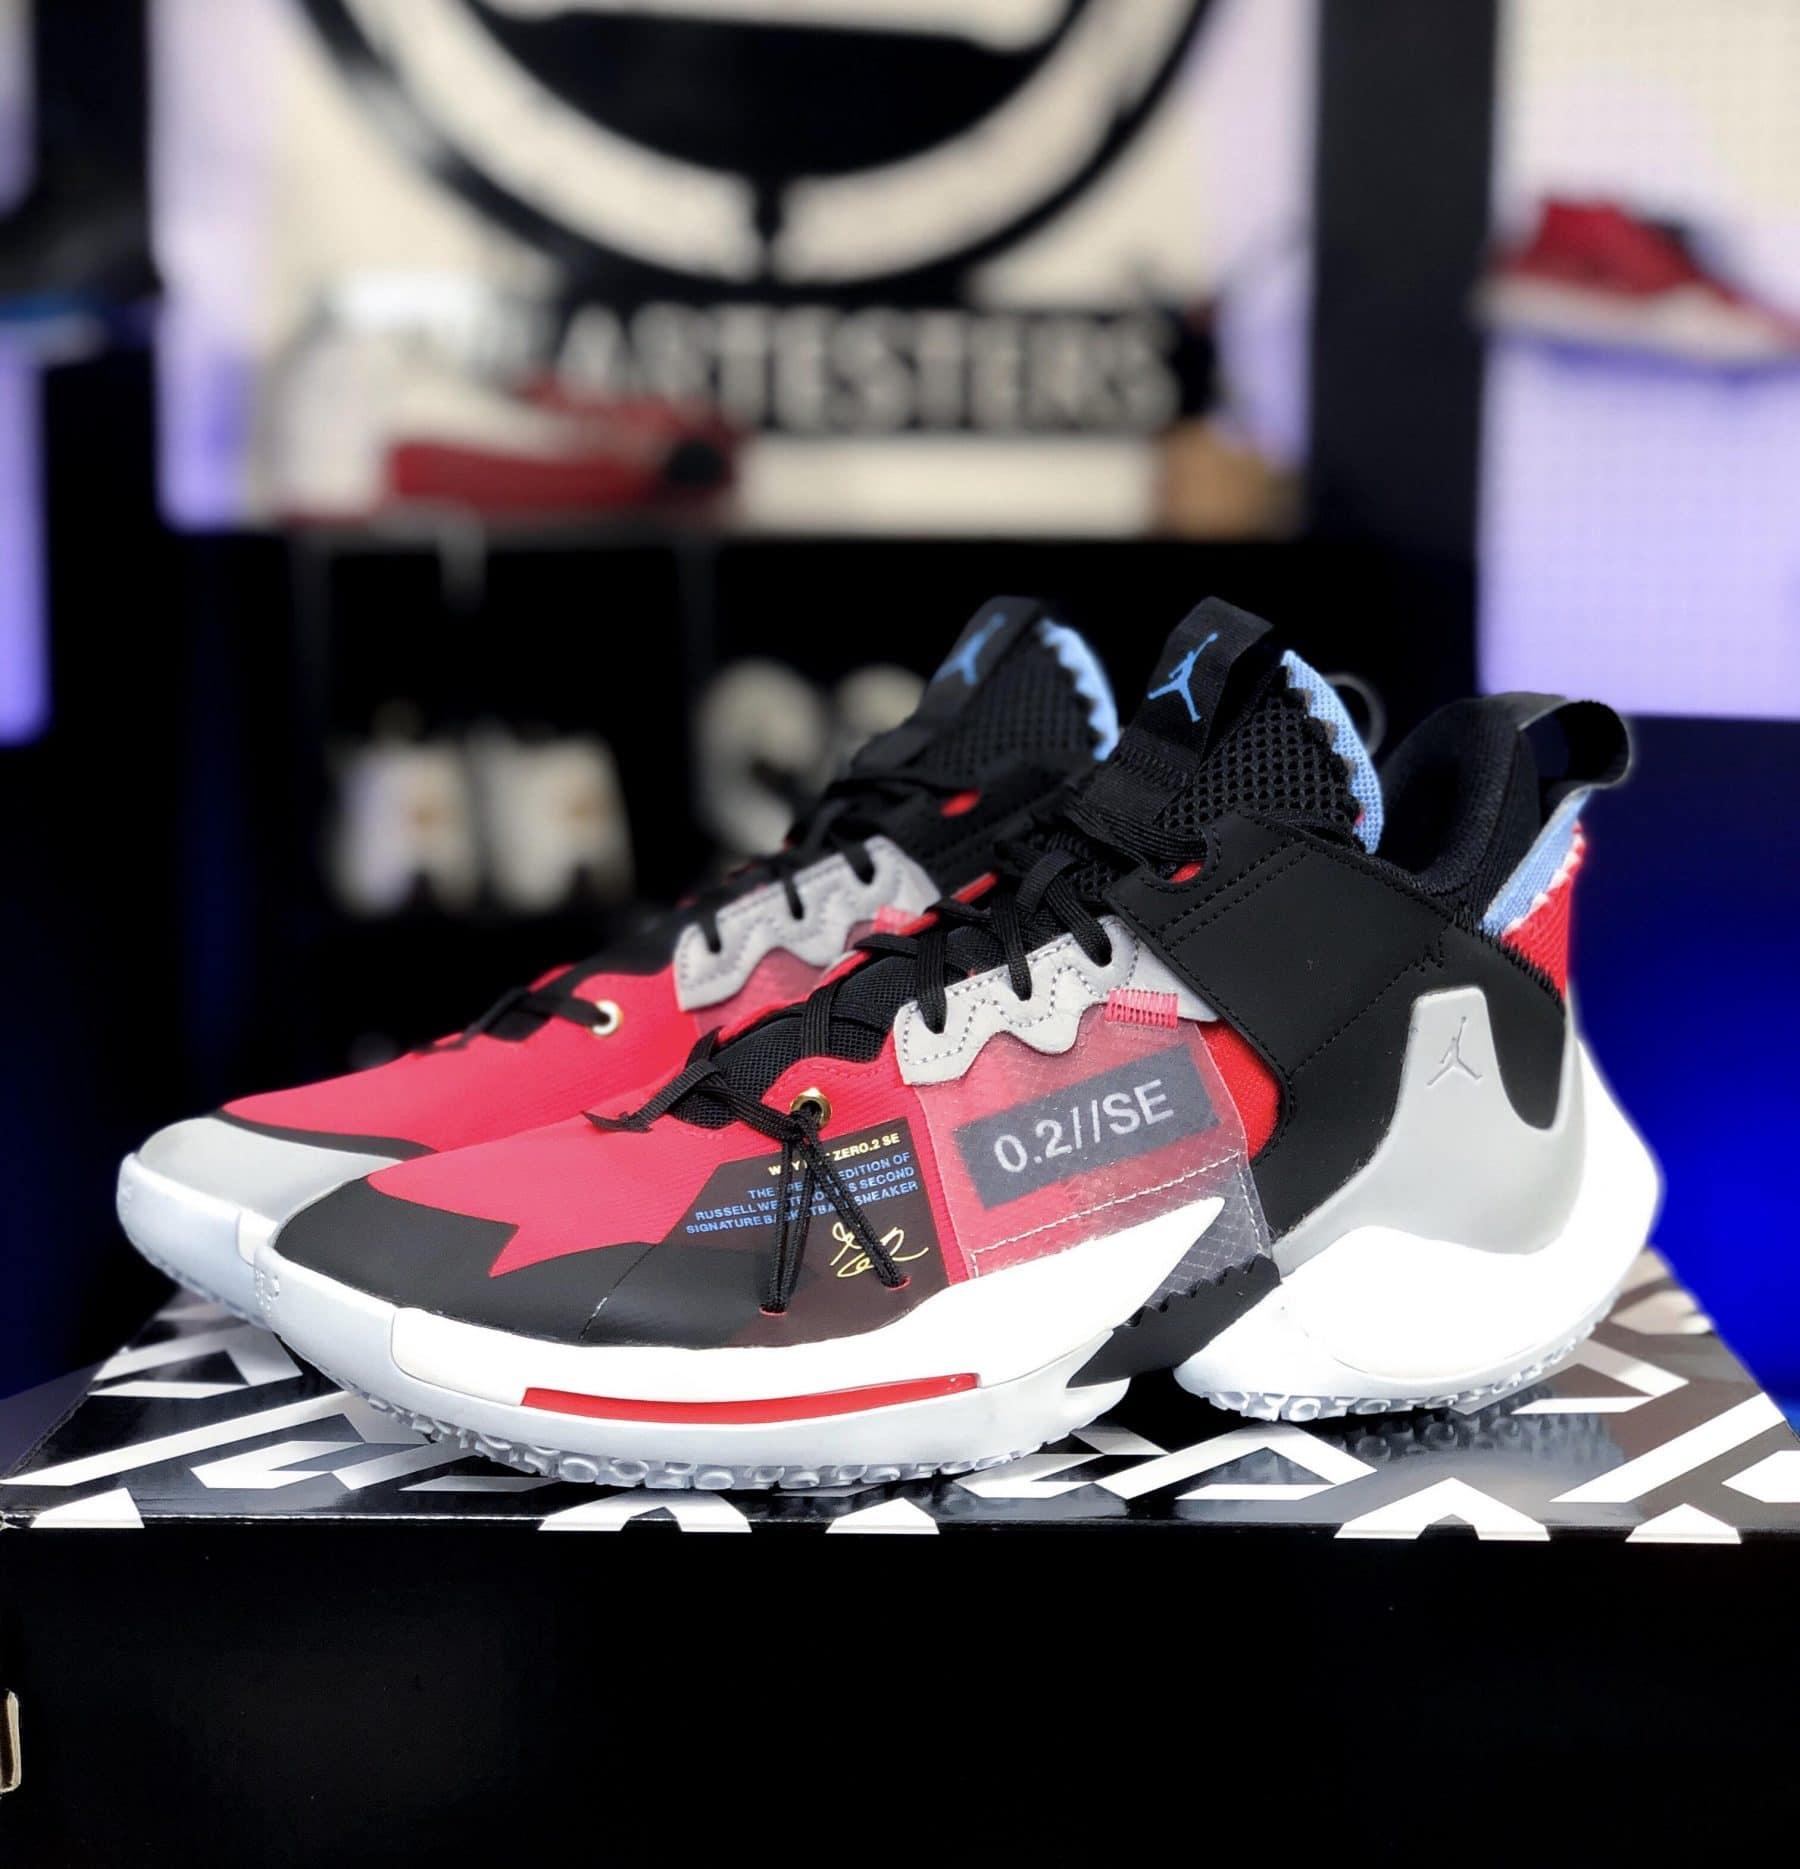 Donación America mensaje  Jordan Why Not Zero.2 SE | Detailed Look and Review - WearTesters